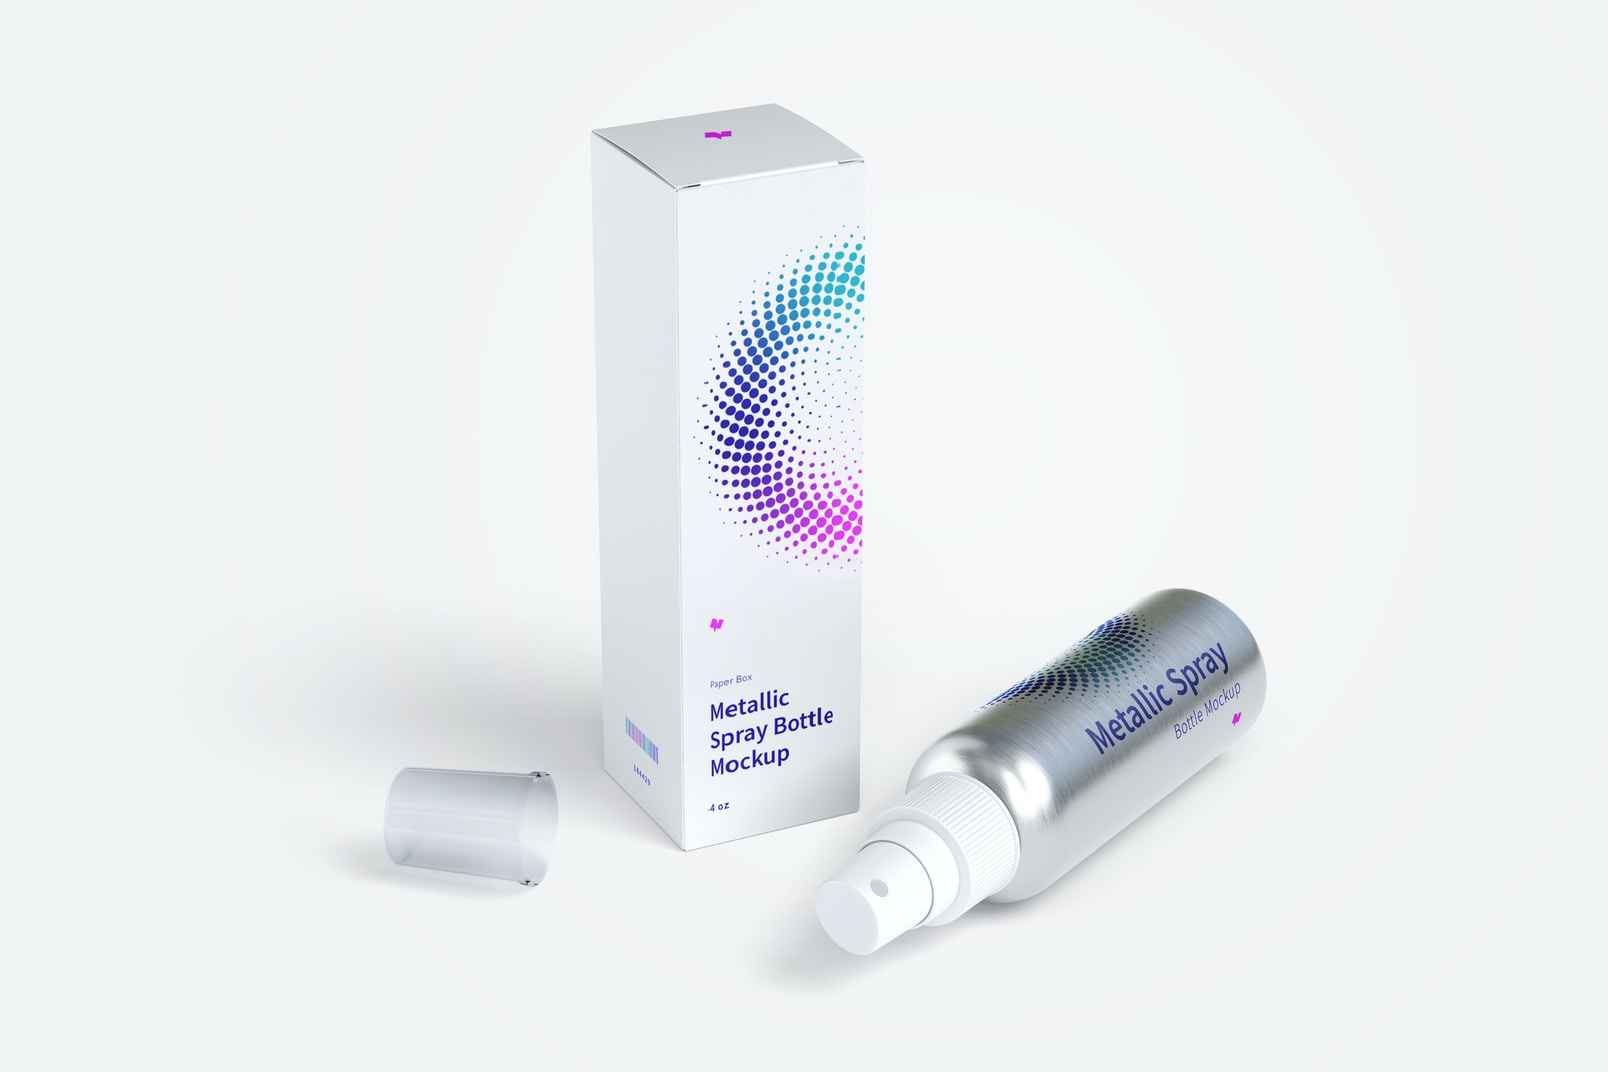 4 oz Metallic Spray Bottle Mockup with Paper Box